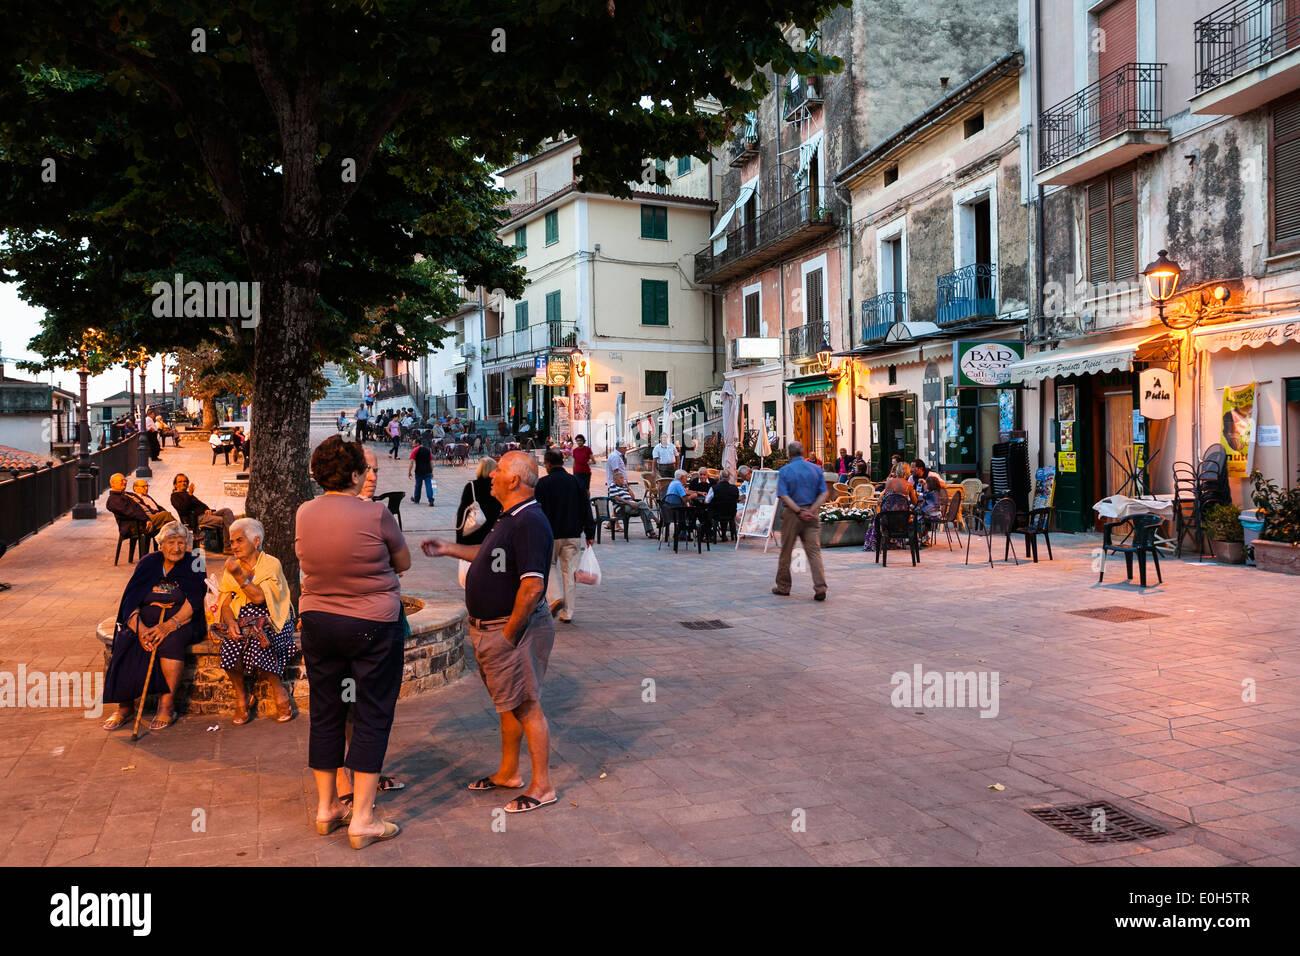 Streetlife in Pisciotta, Cilento, Tyrrhenian Sea, Mediterranean, Southern Italy, Europe - Stock Image